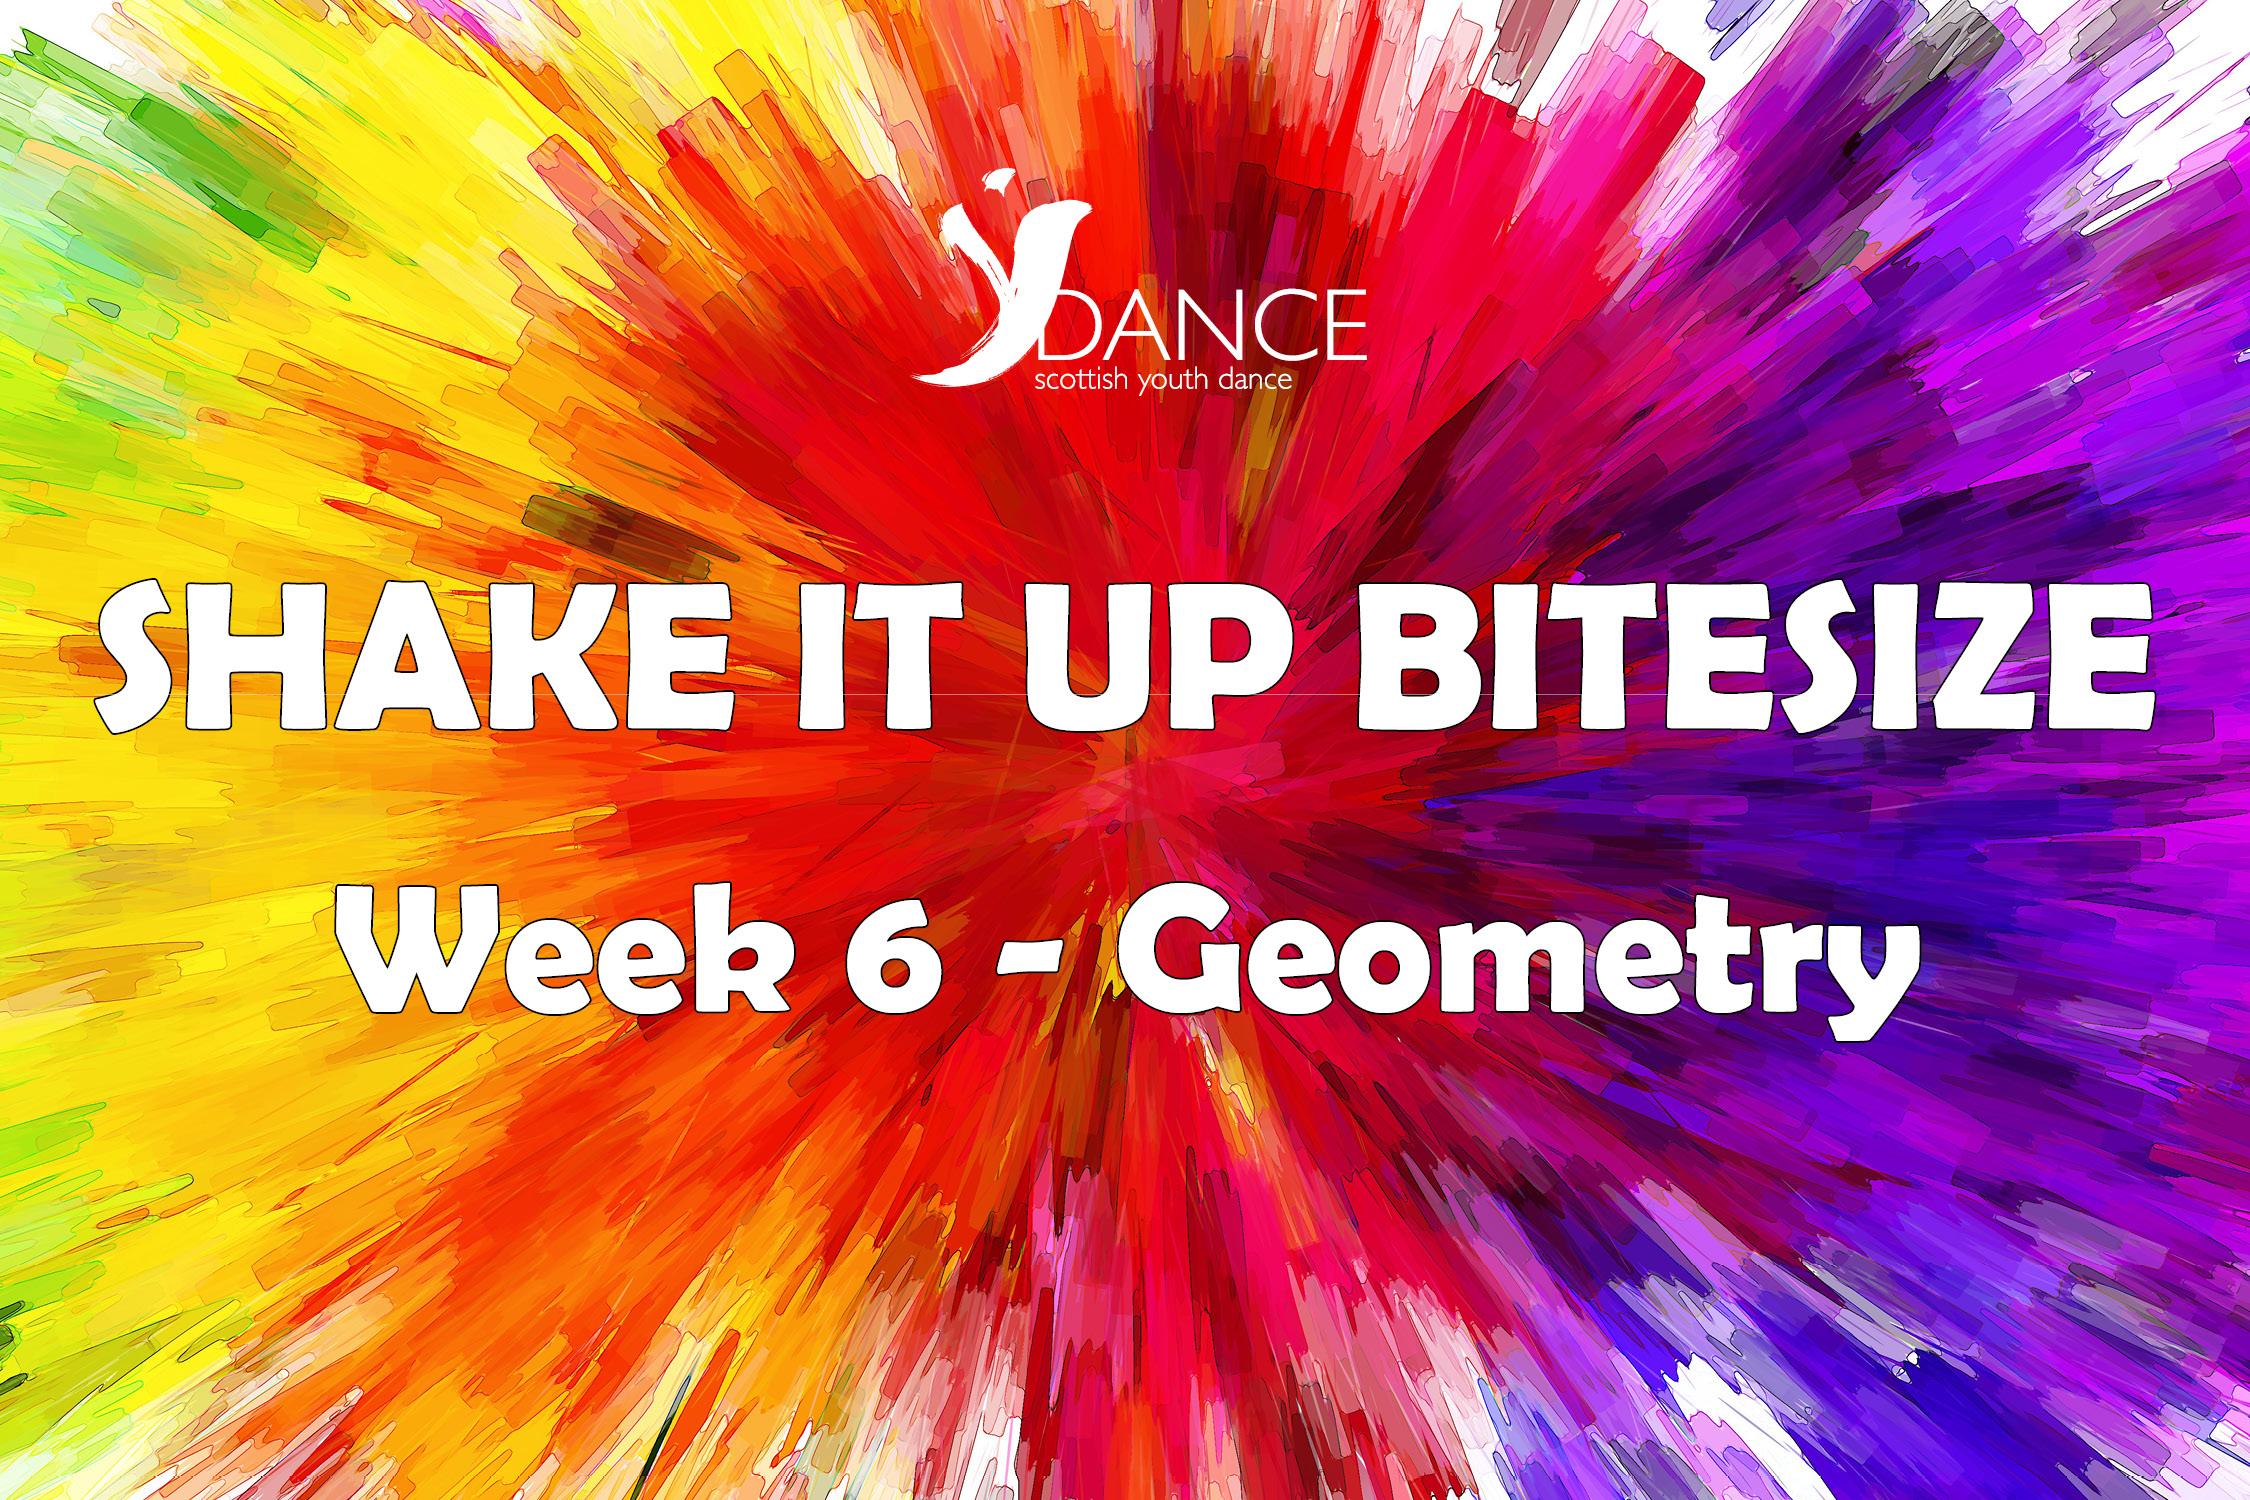 SIU Bitesize - Wk6 - Geometry